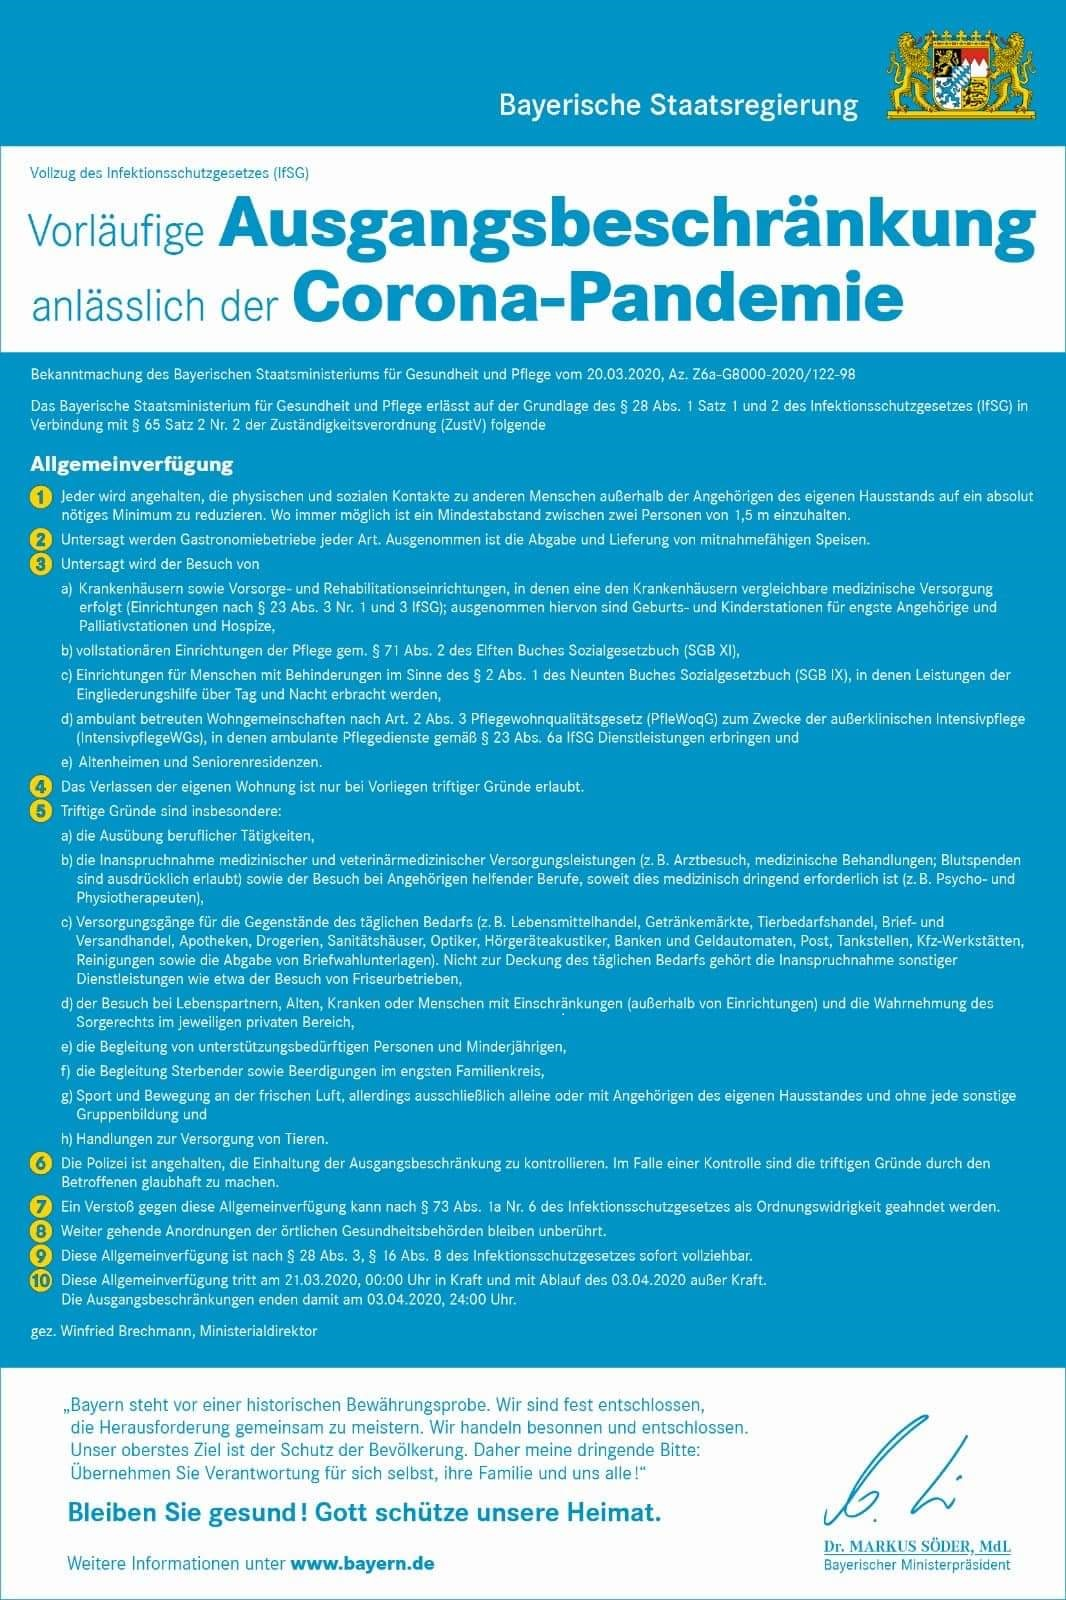 Bayerische Staatsregierung Ausgangsbeschränkung Coronavirus